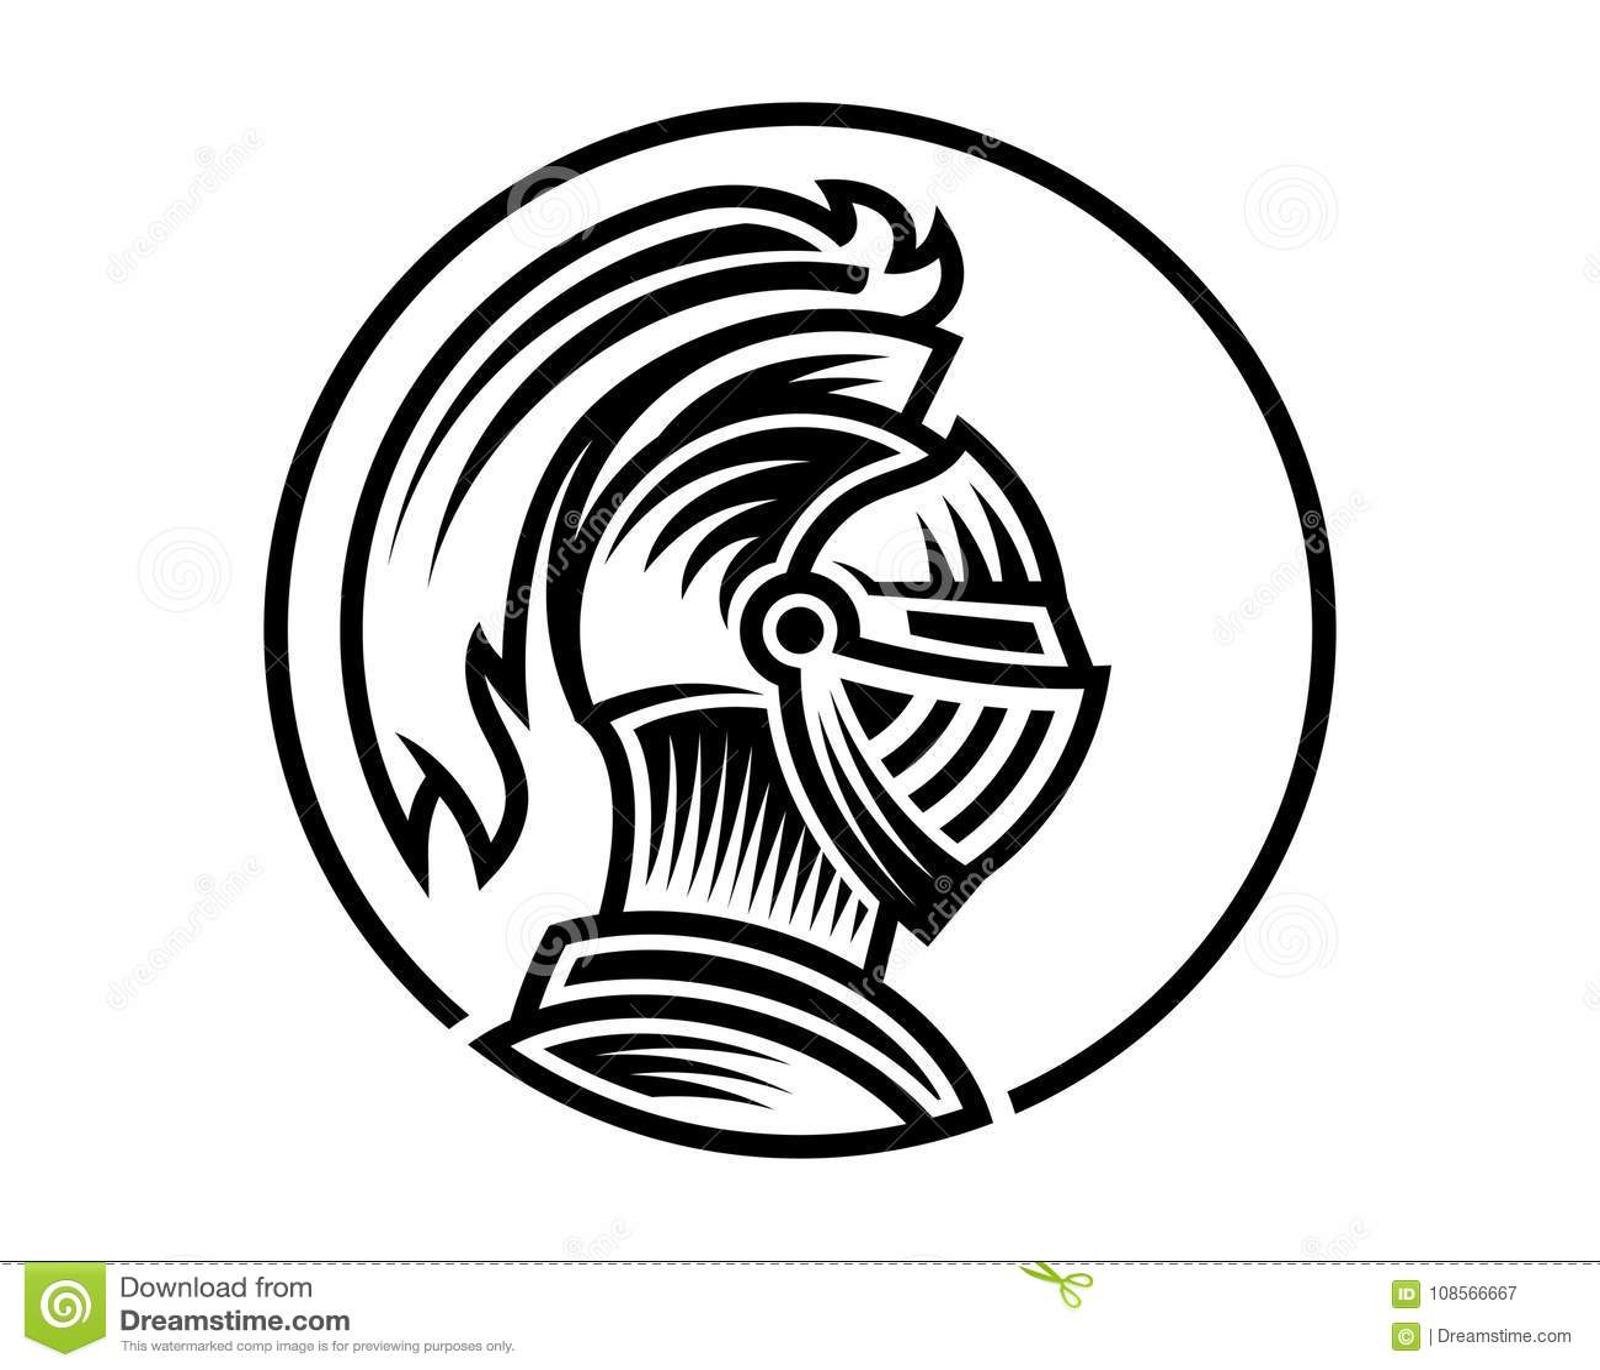 Knight Logo Stock Images, Royalty-Free Images & Vectors ...  Knights Helmet Logo